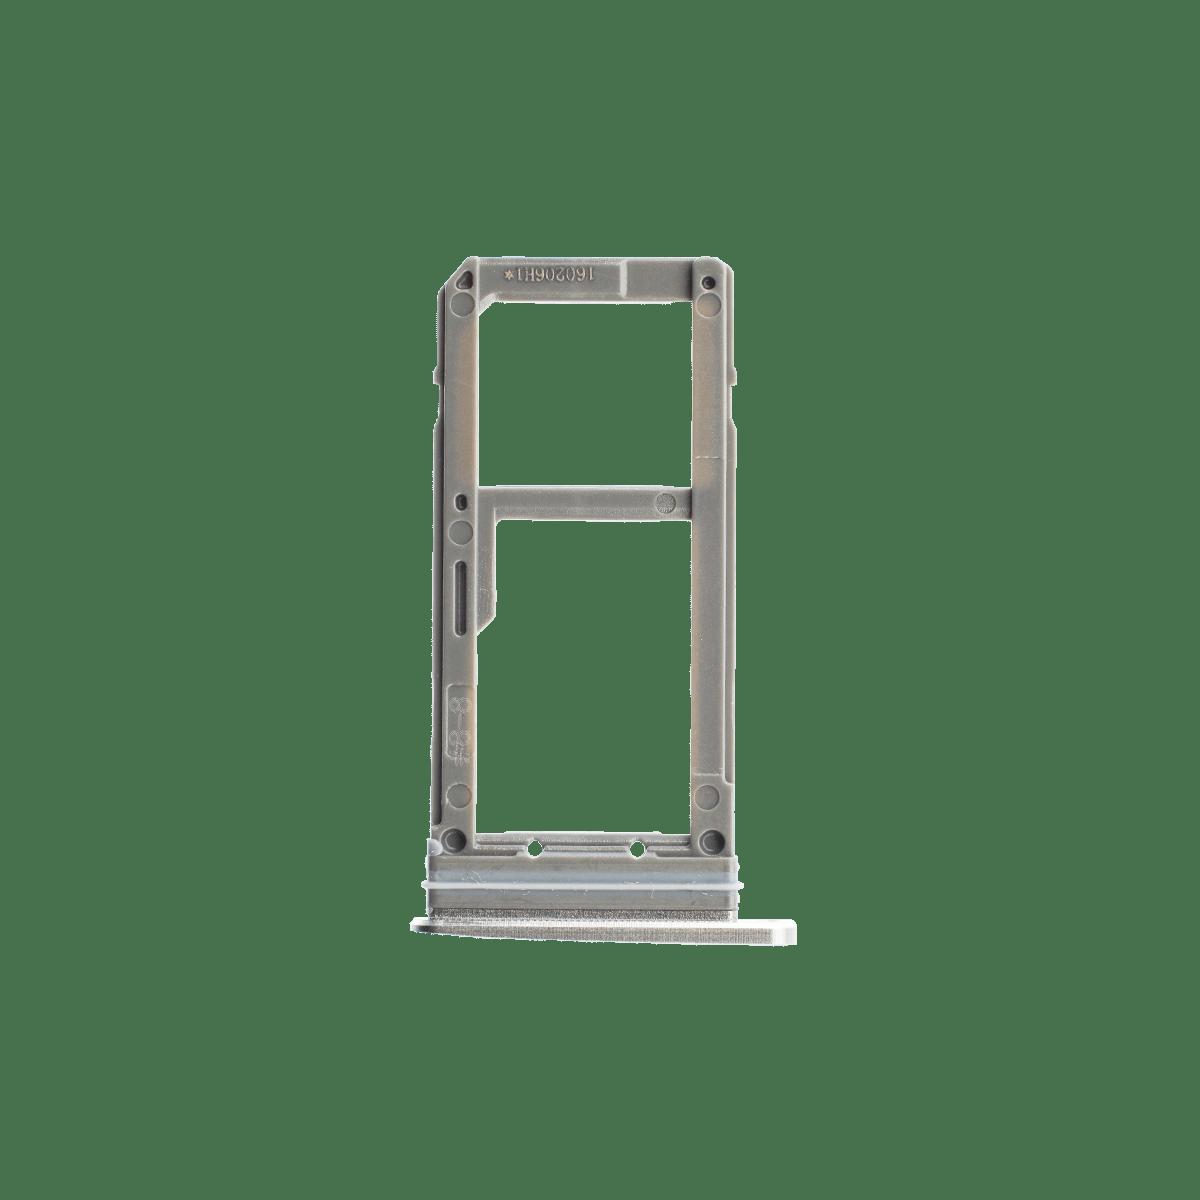 Samsung Galaxy S7 Gold Nano Sim Card Amp Microsd Card Tray